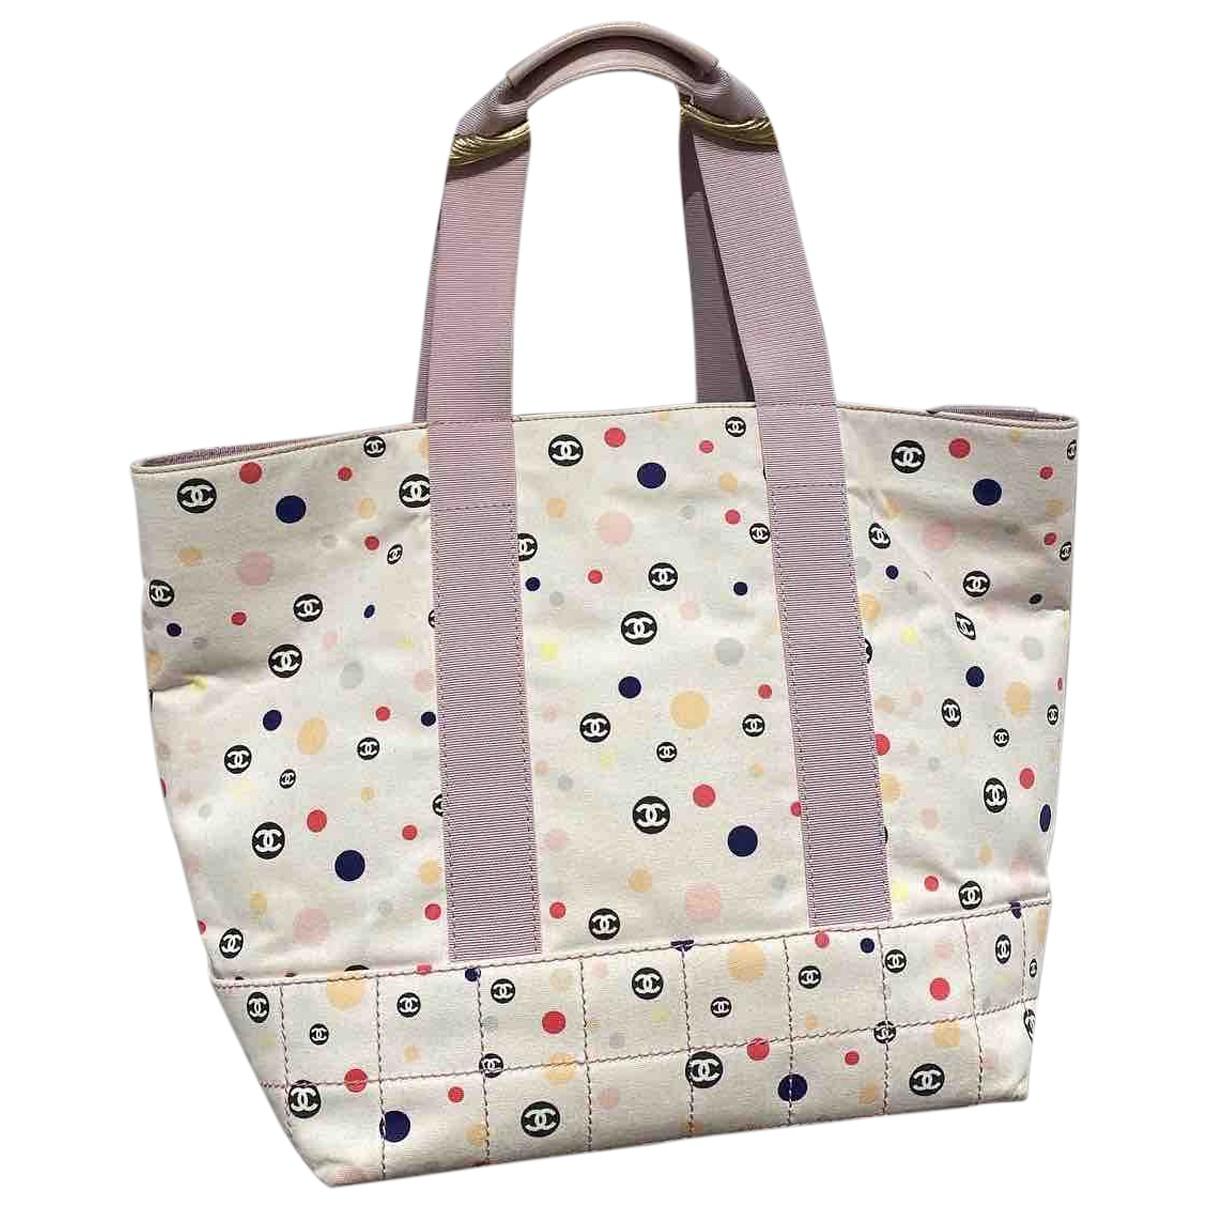 Chanel \N Multicolour Cloth handbag for Women \N